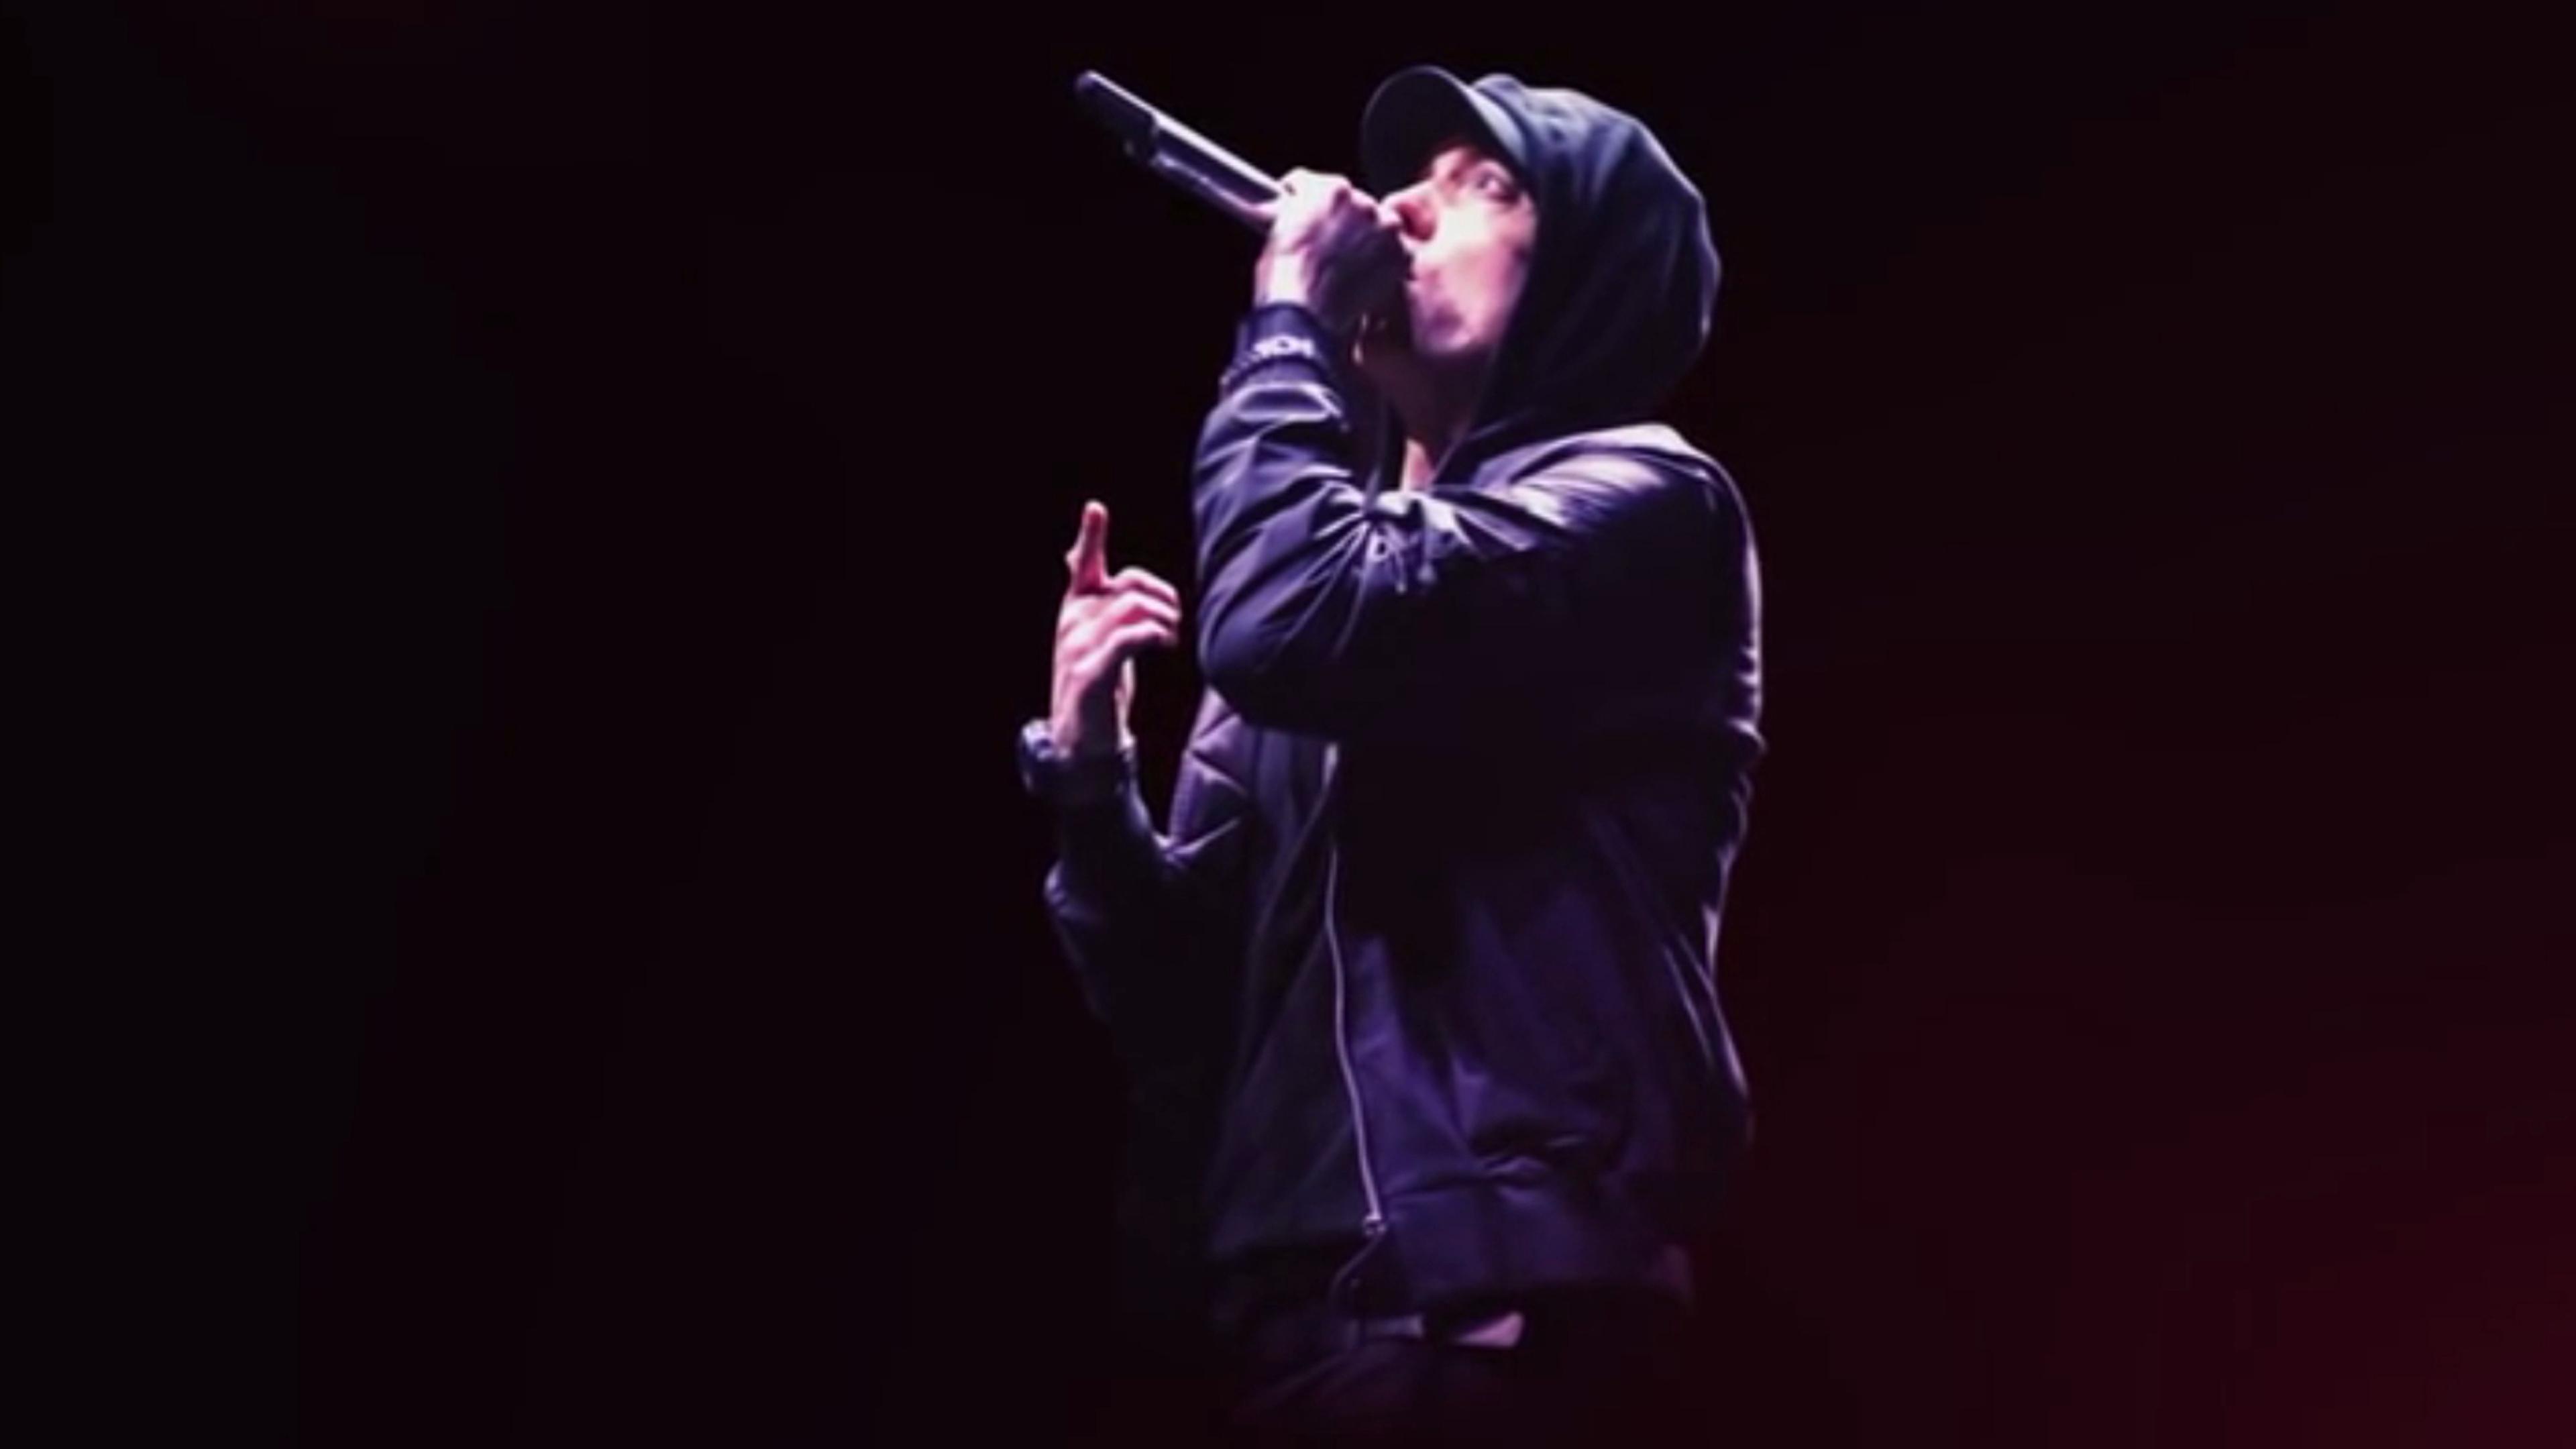 [Архив ePro] Полная запись с вечеринки Dr. Dre и Eminem'а — «It was a good day: The live 90s hip-hop playlist»